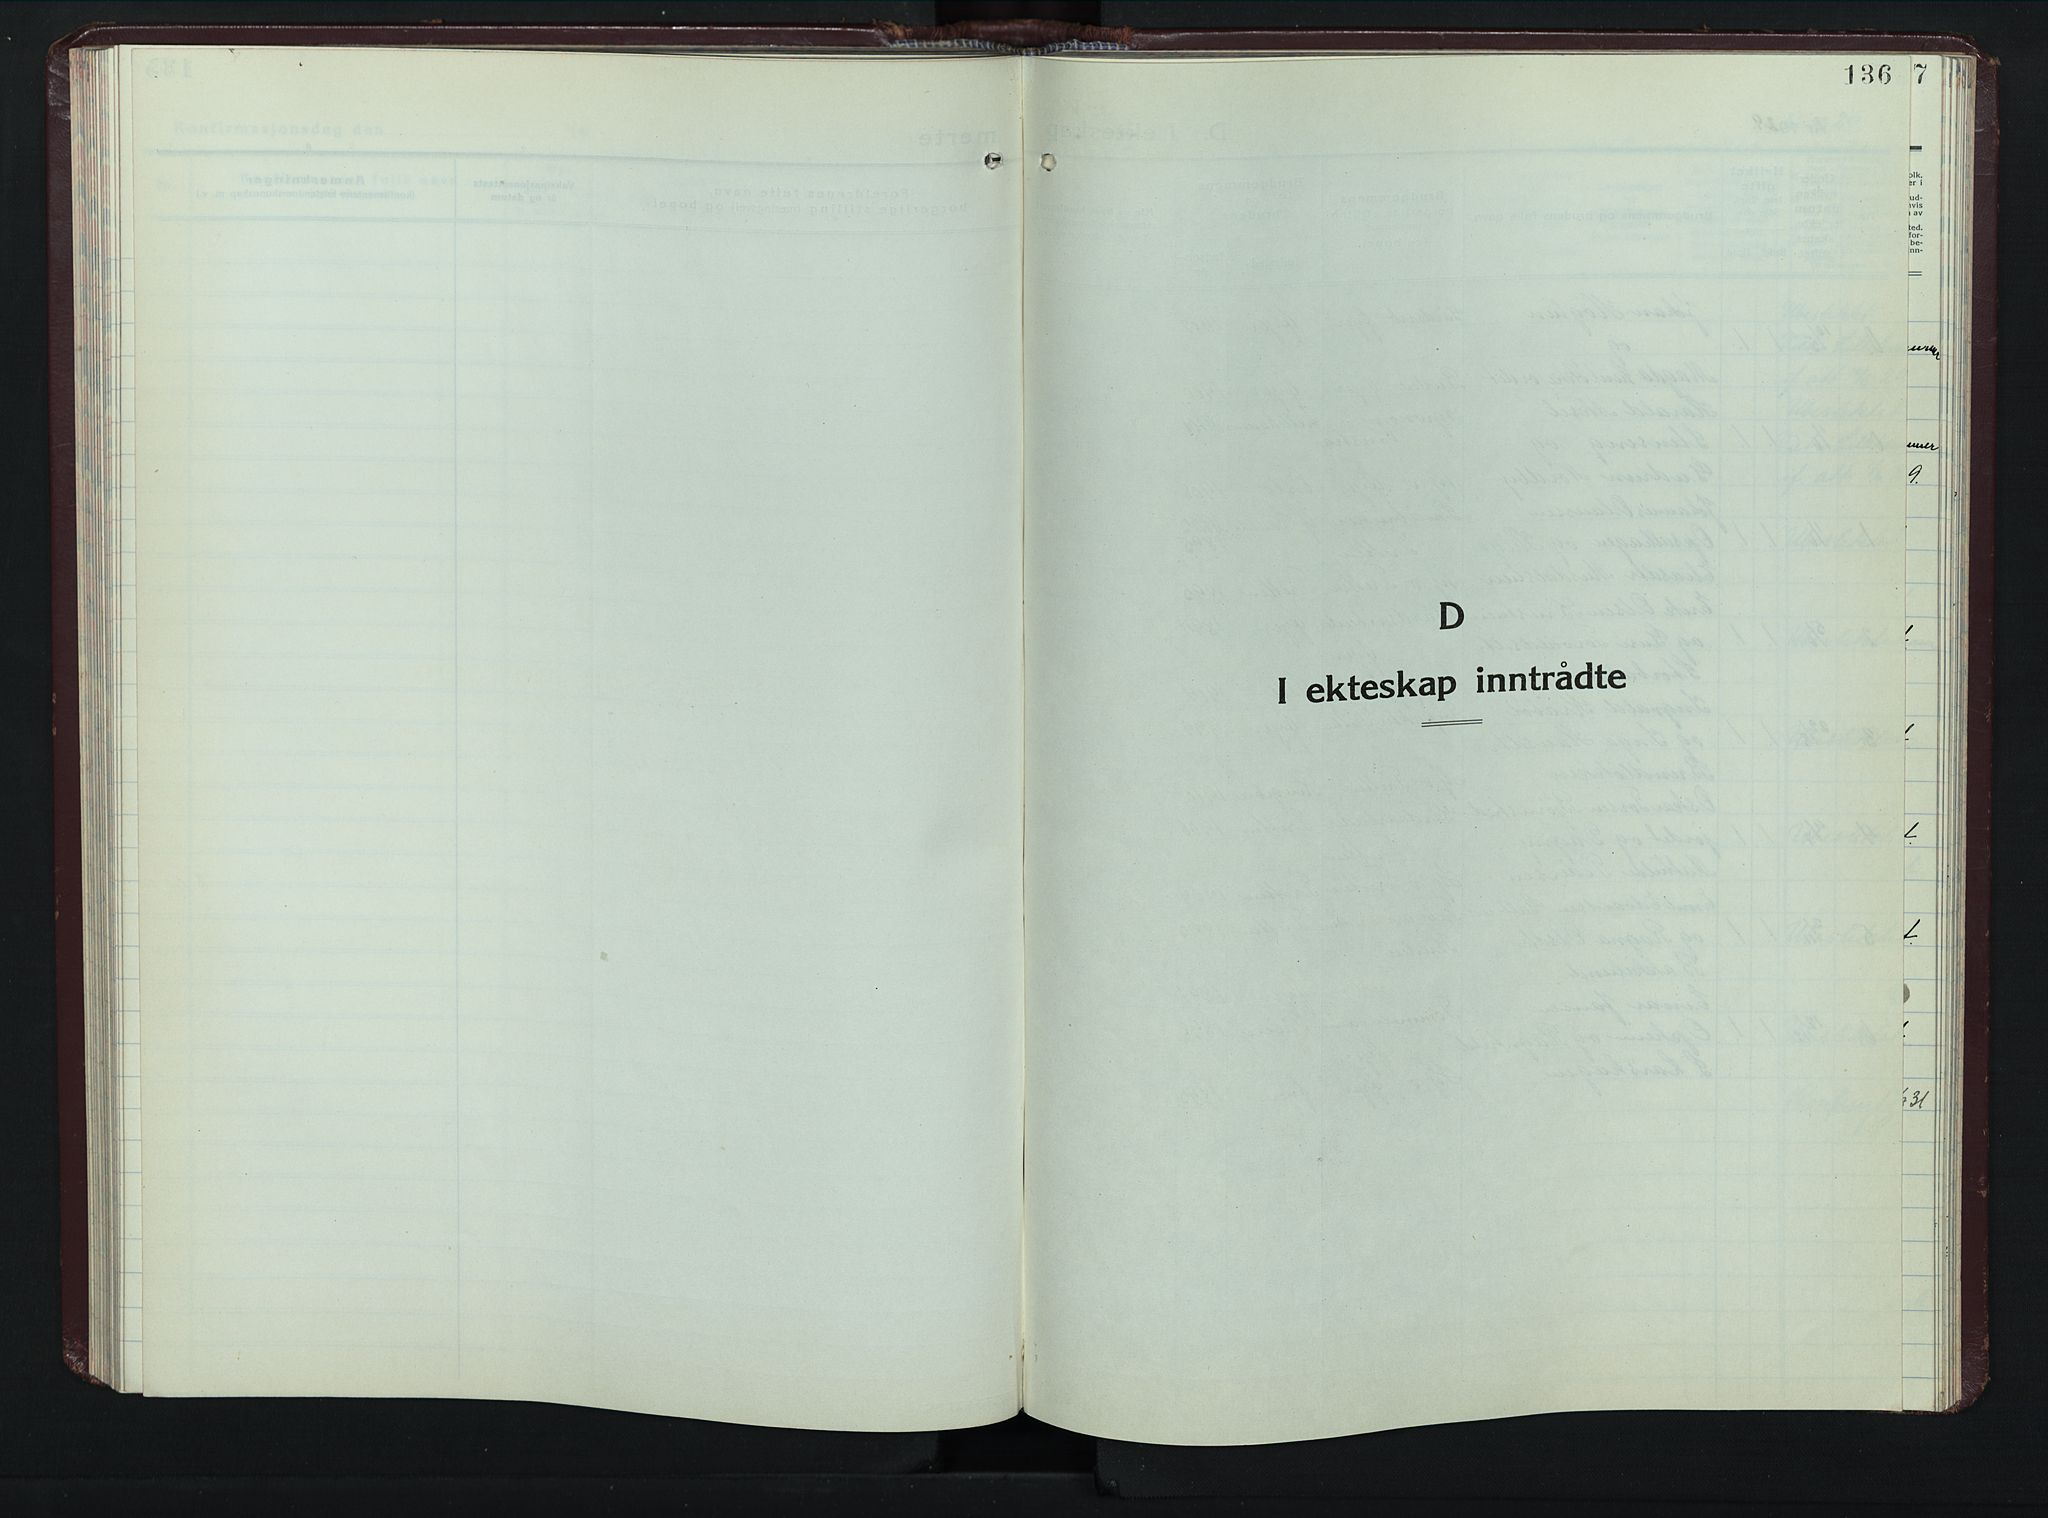 SAH, Øyer prestekontor, Klokkerbok nr. 8, 1929-1947, s. 136